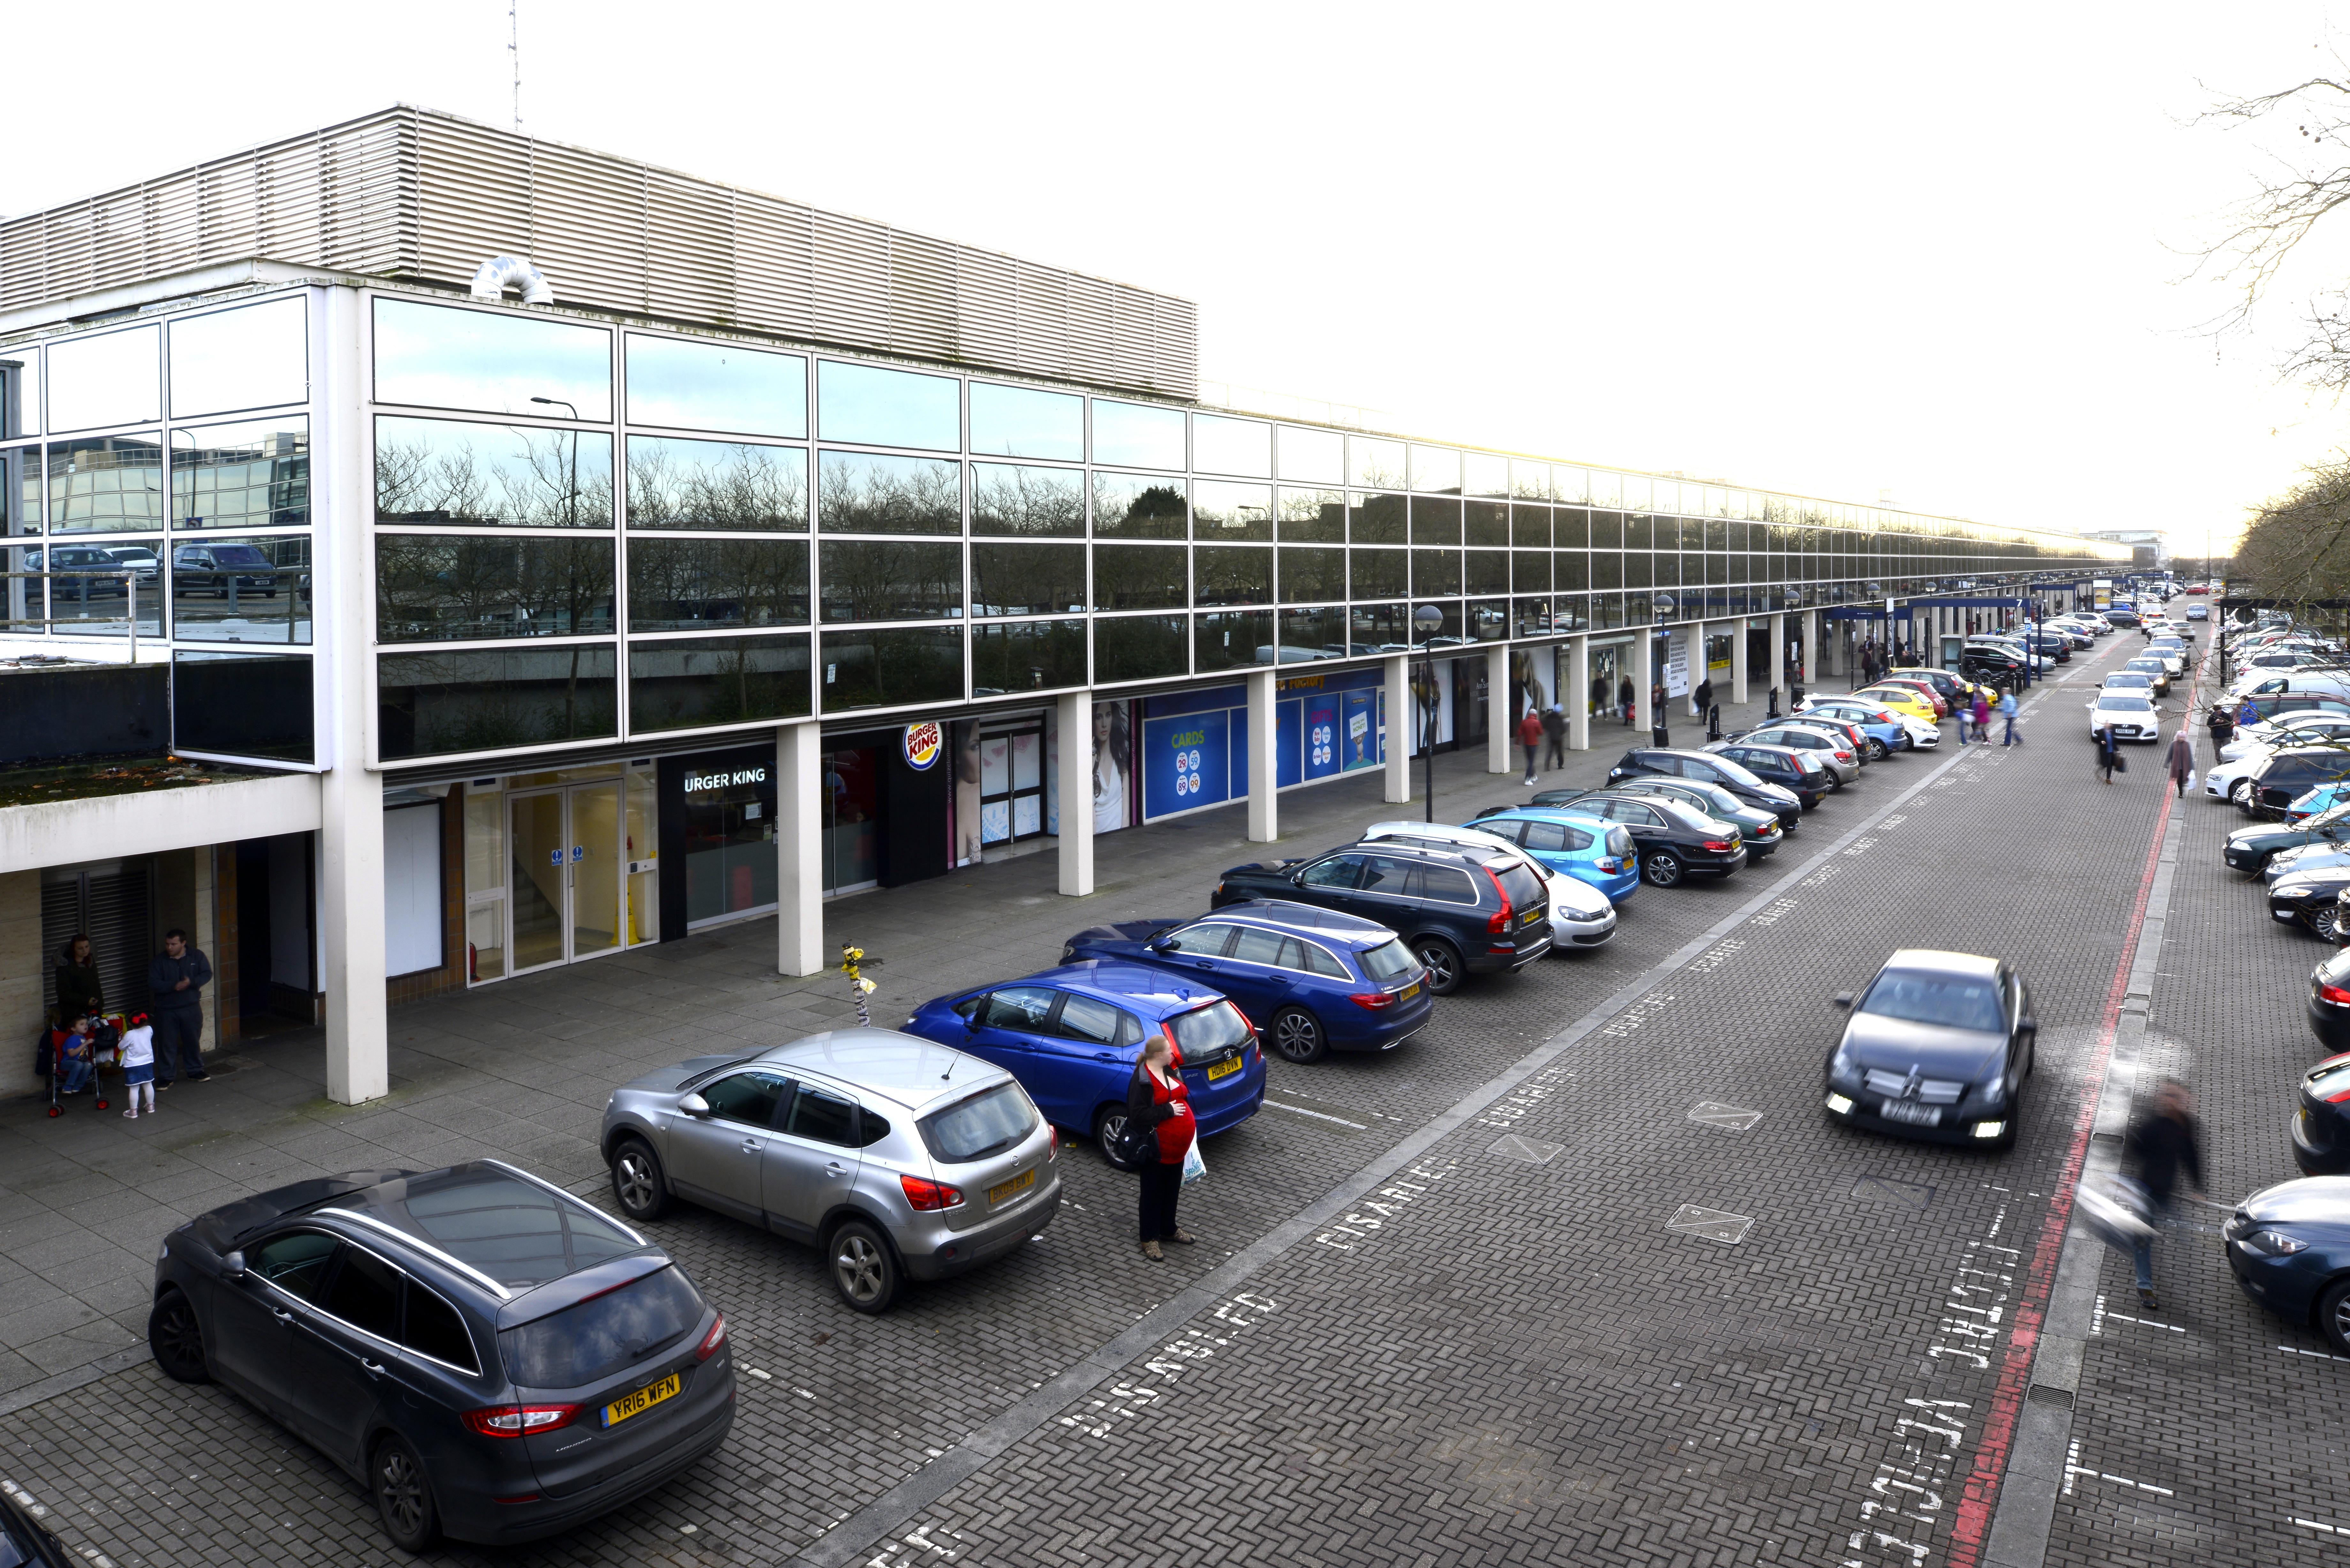 Milton Keynes Shopping Building -Derek Walker, Stuart Mosscrop and Christopher Woodward, 1973-9. Image: Elain Harwood